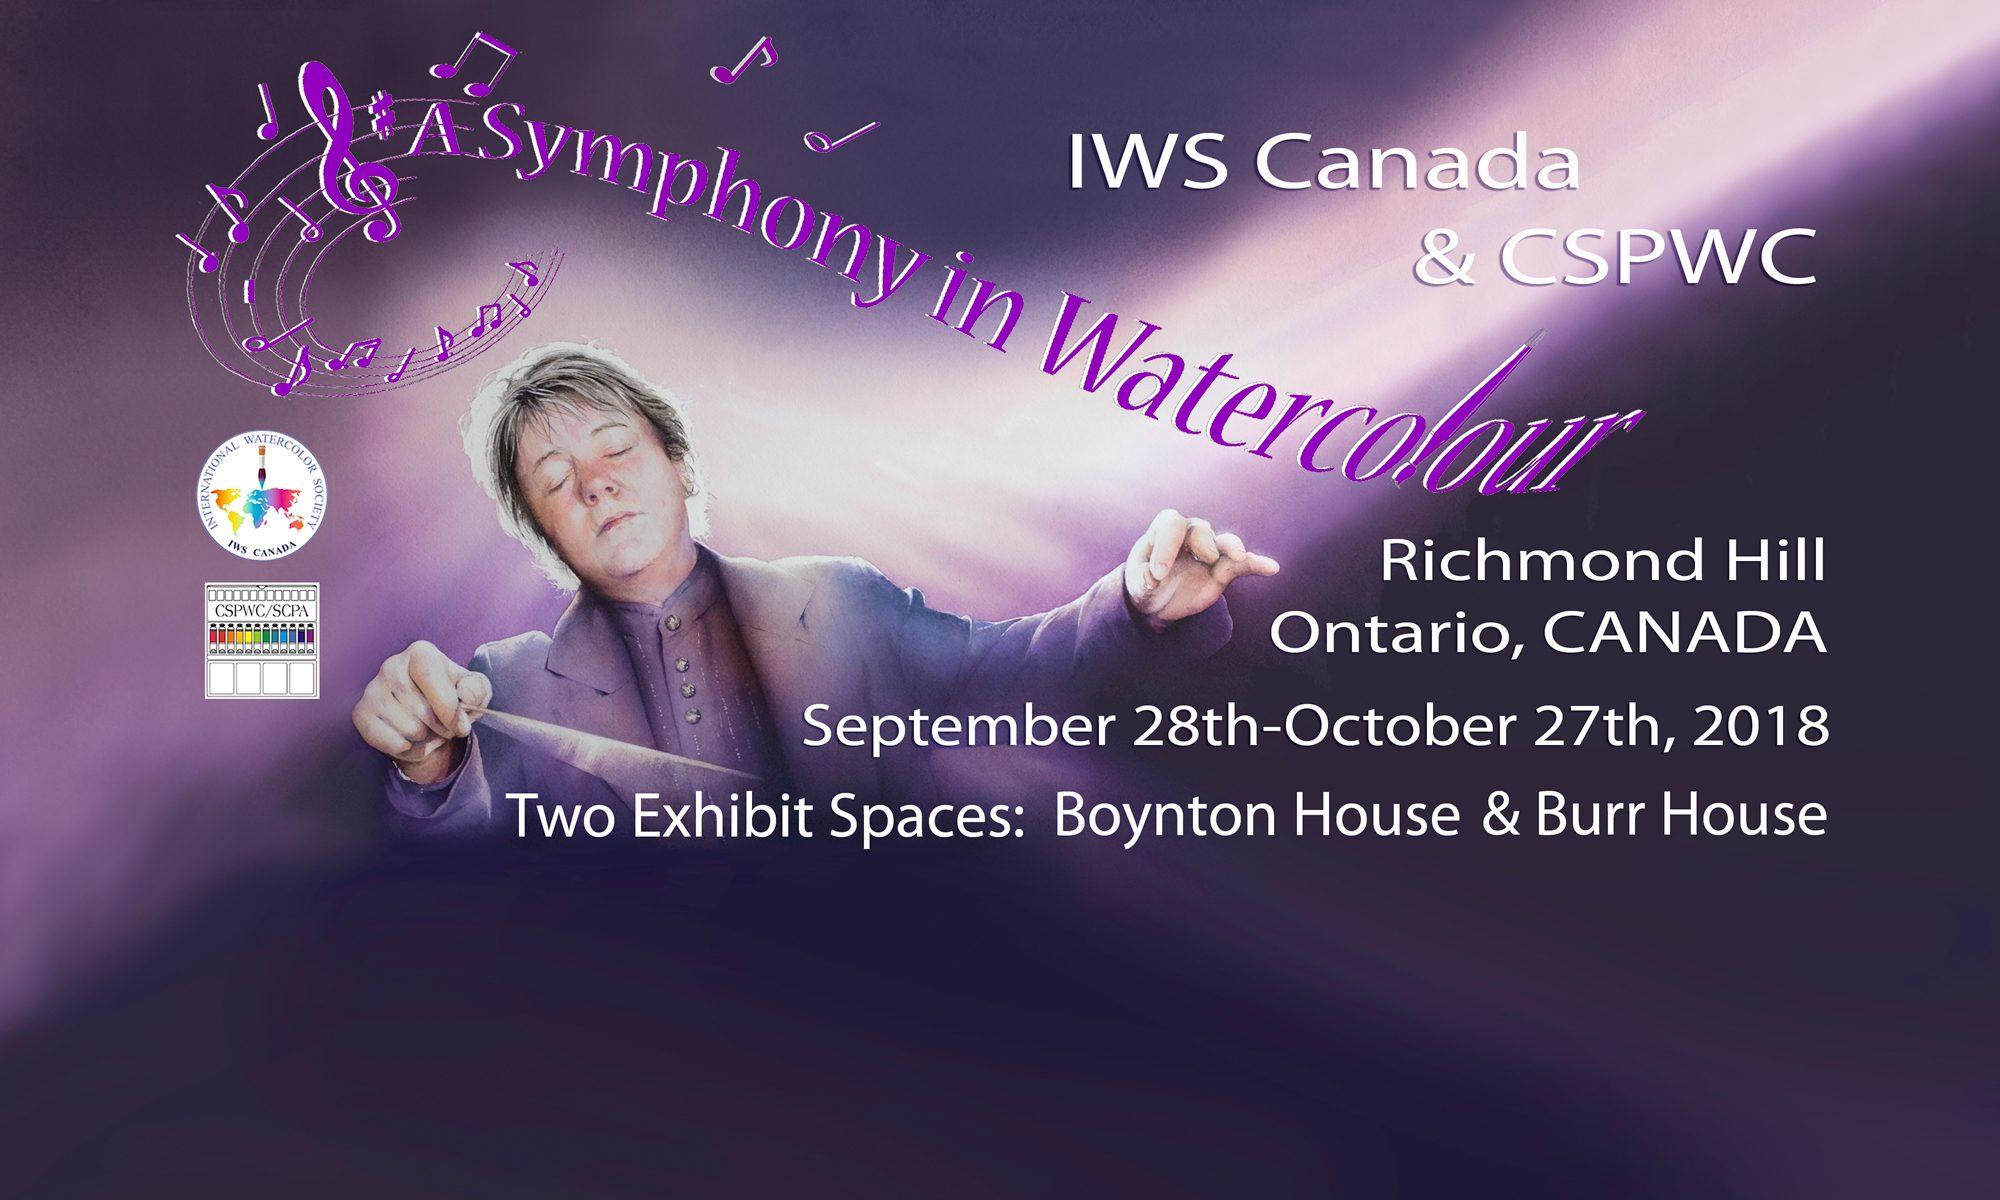 IWS Canada